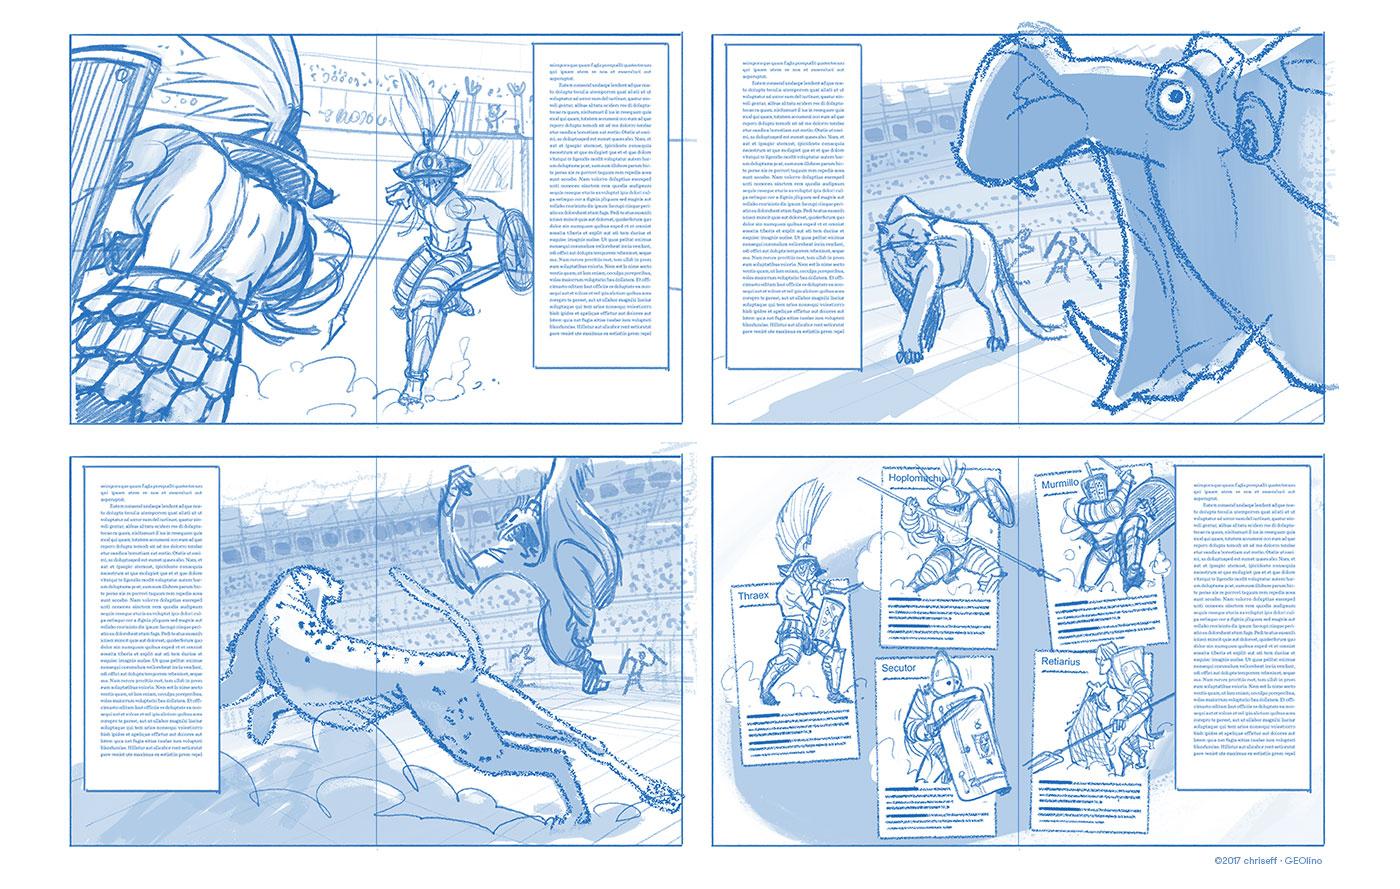 editorial illustration gladiatoren sketches doublespreads for geolino - christian effenberger